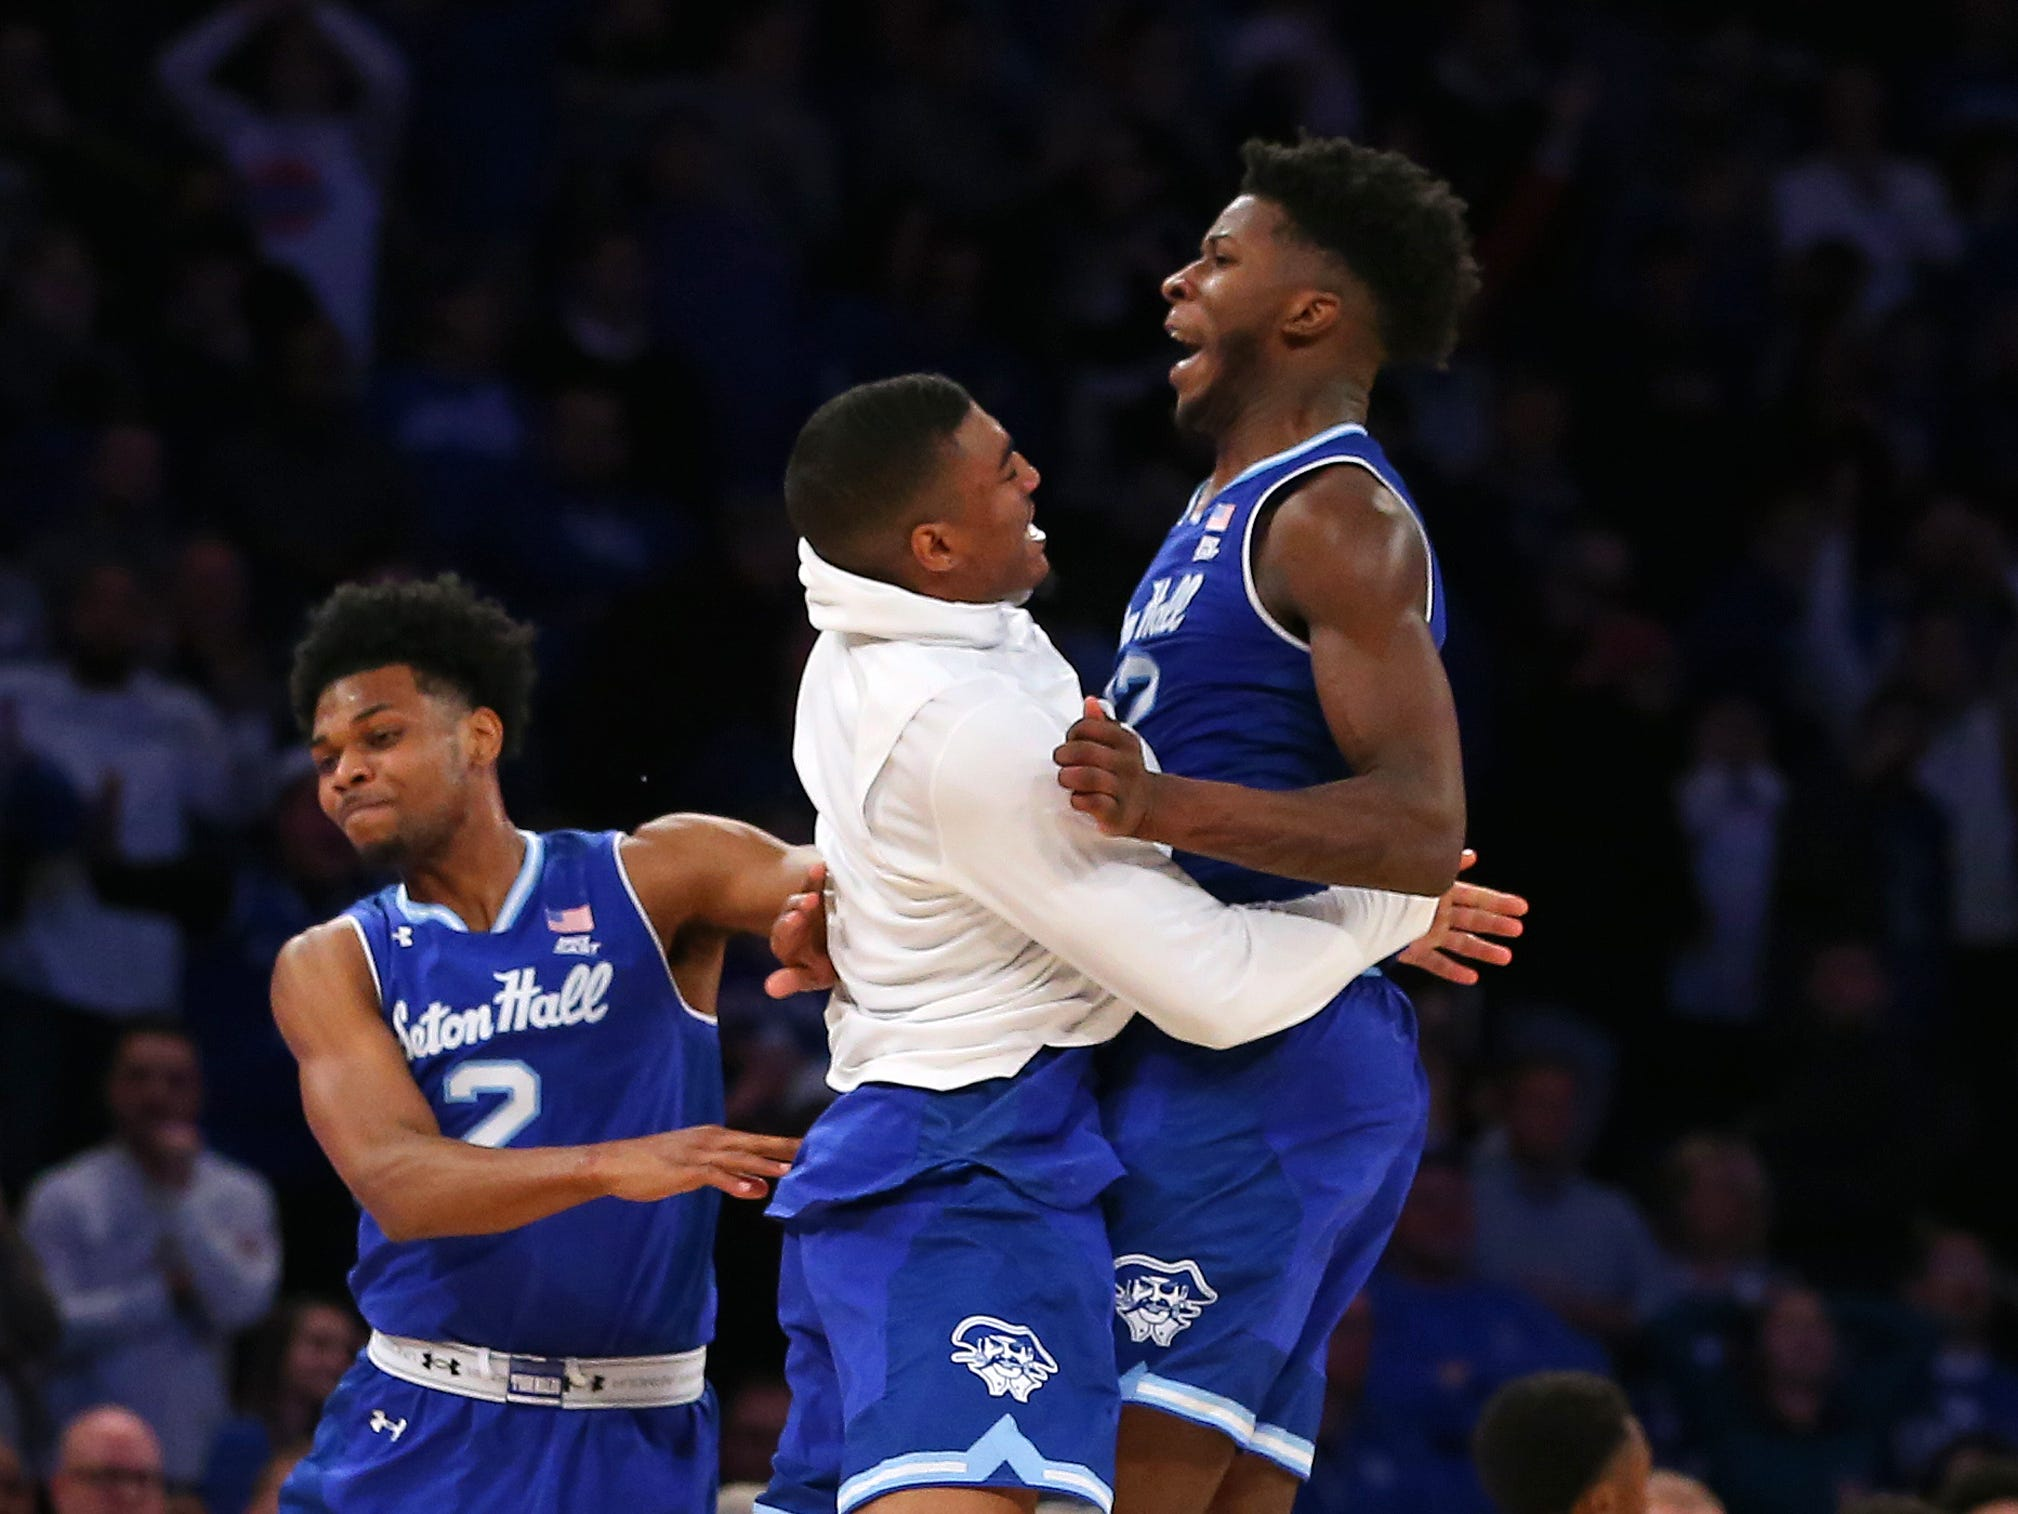 Back-to-back buzzer-beaters highlight Seton Hall's thrilling upset of No. 8 Kentucky